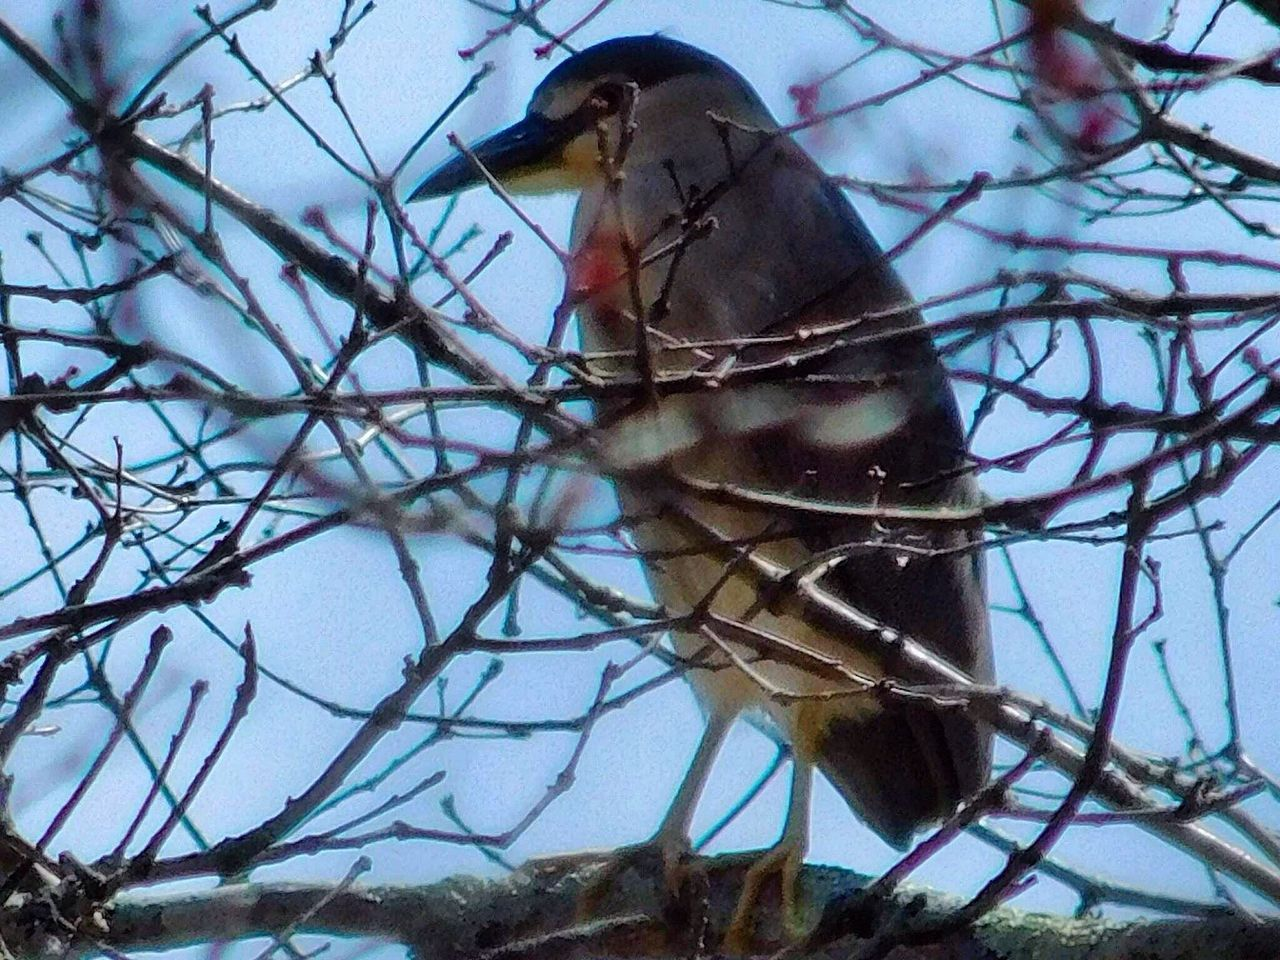 Animal Themes Animals In The Wild Bird One Animal Branch Animal Wildlife No People Perching Nature Day Bird Photography Birds Of EyeEm  Birds_collection Birdwatching